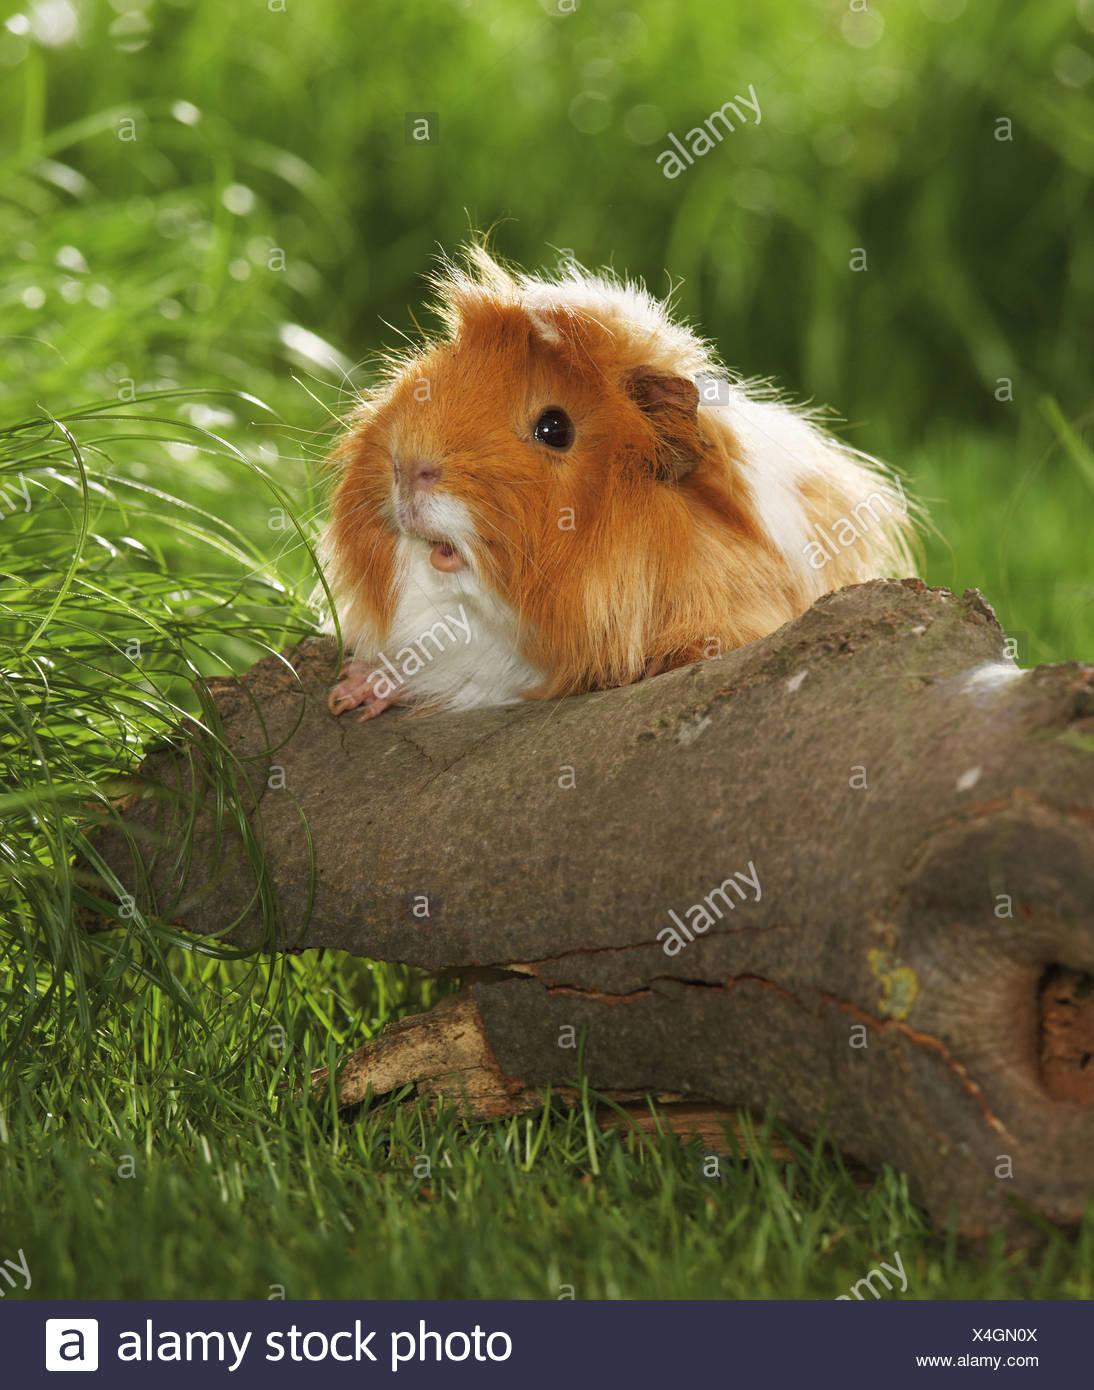 Sheltie guinea pigs - photo#31